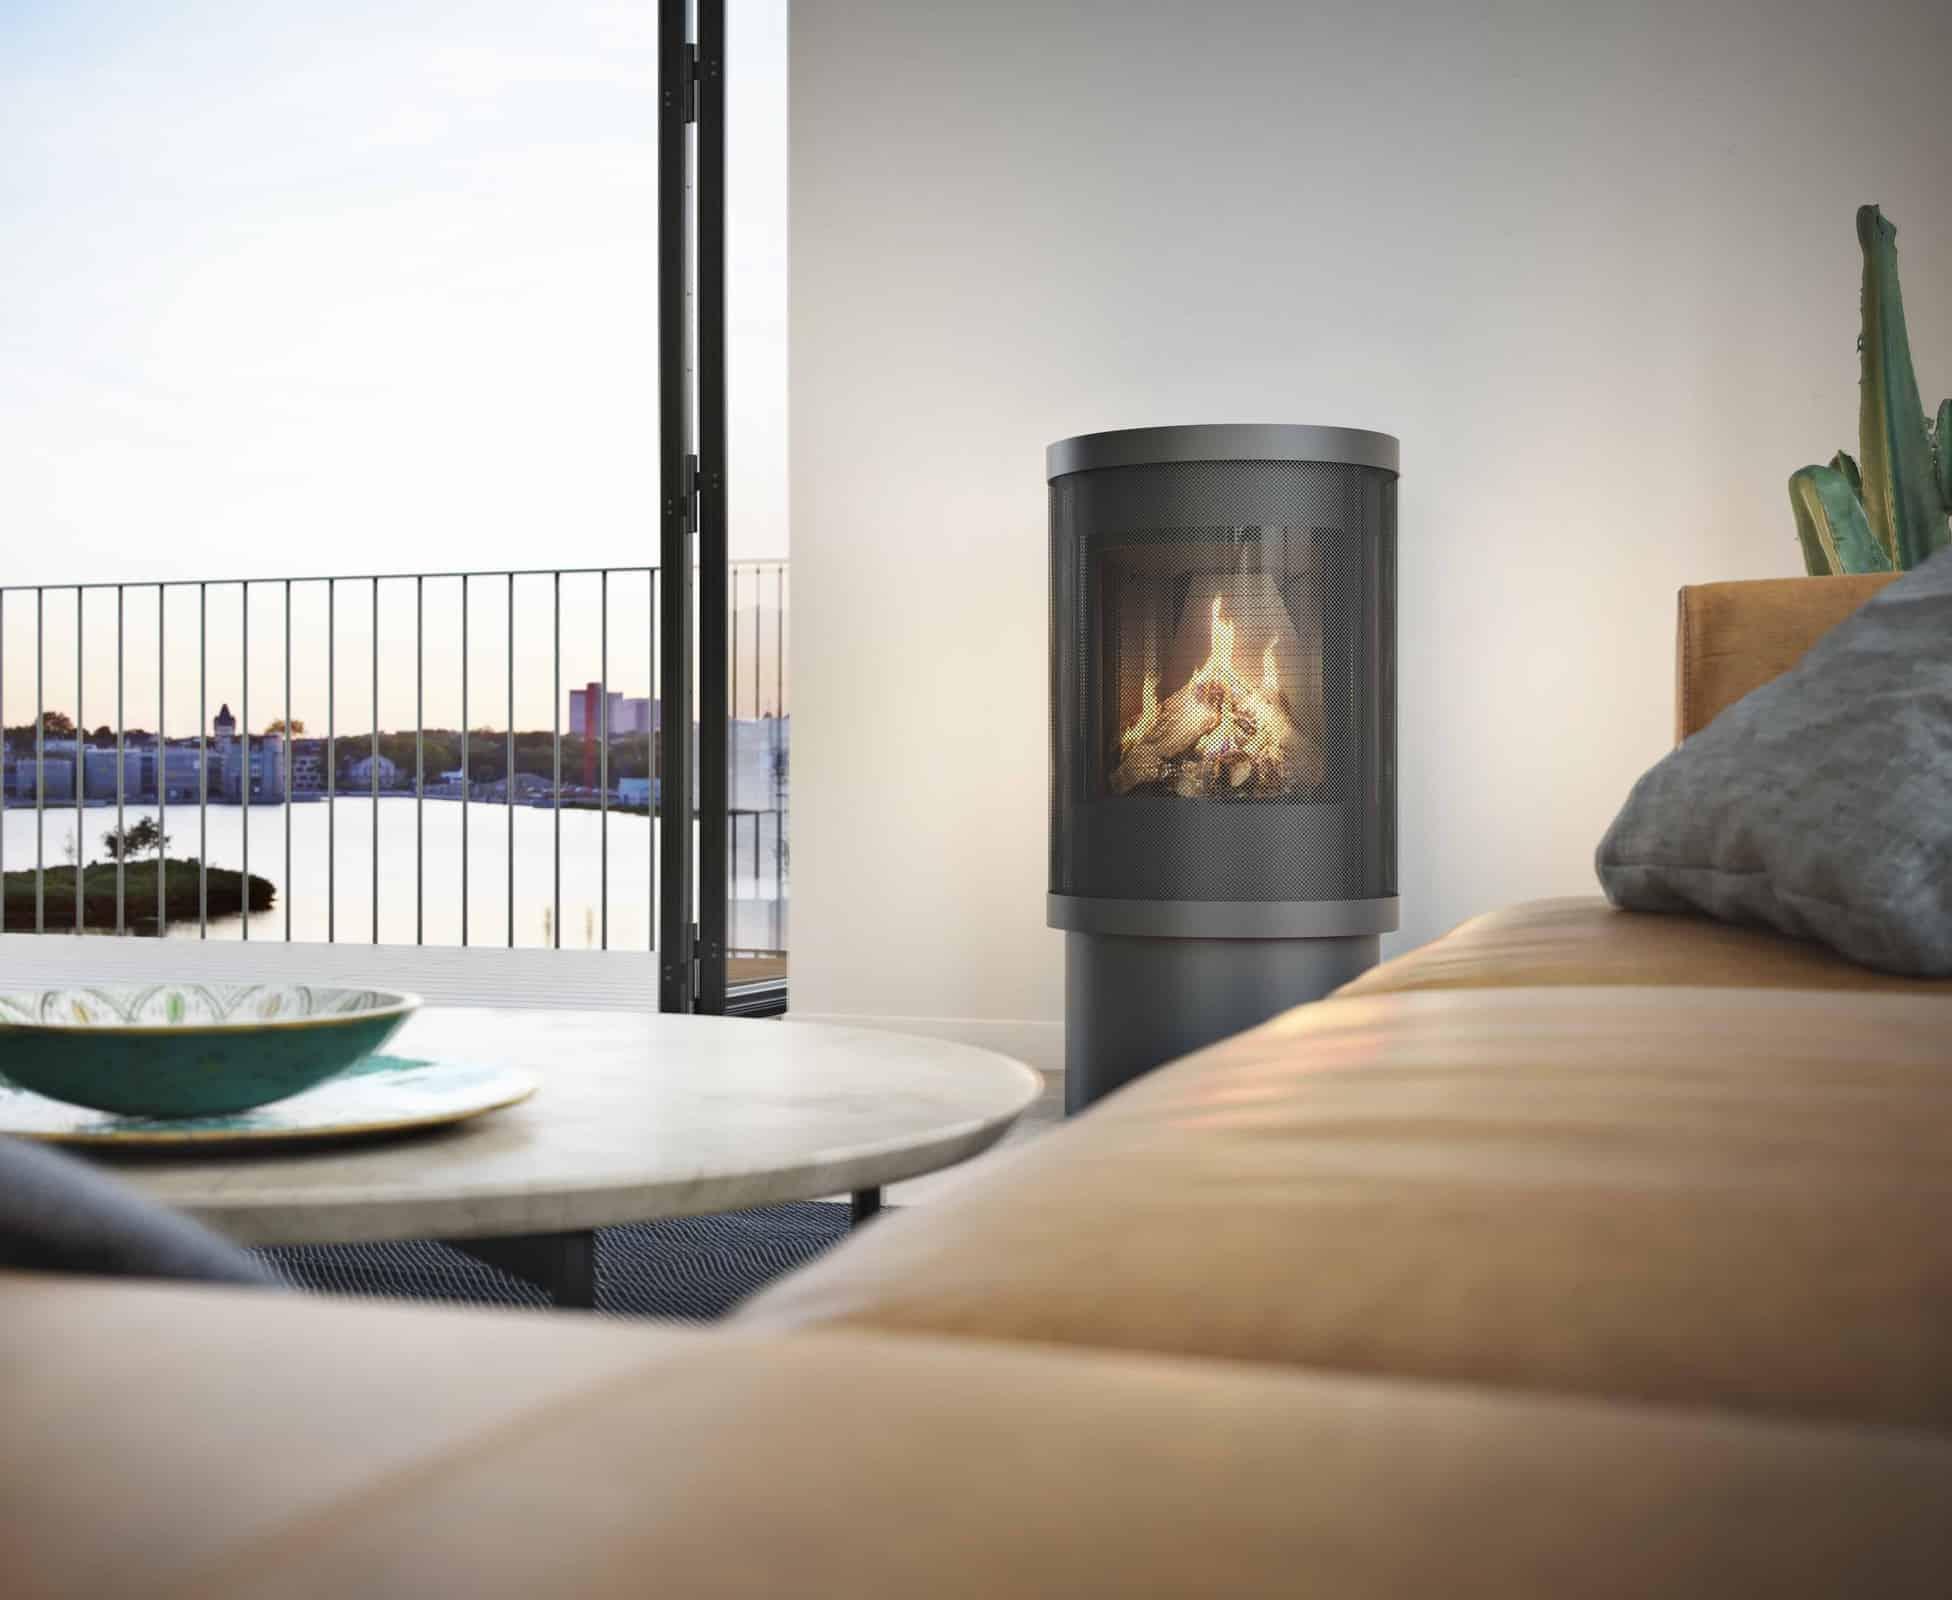 Rais Viva L Gas Series Stove The Green Design Center Rocket Diagram Oven Fireplace Earthen Pint 100 120